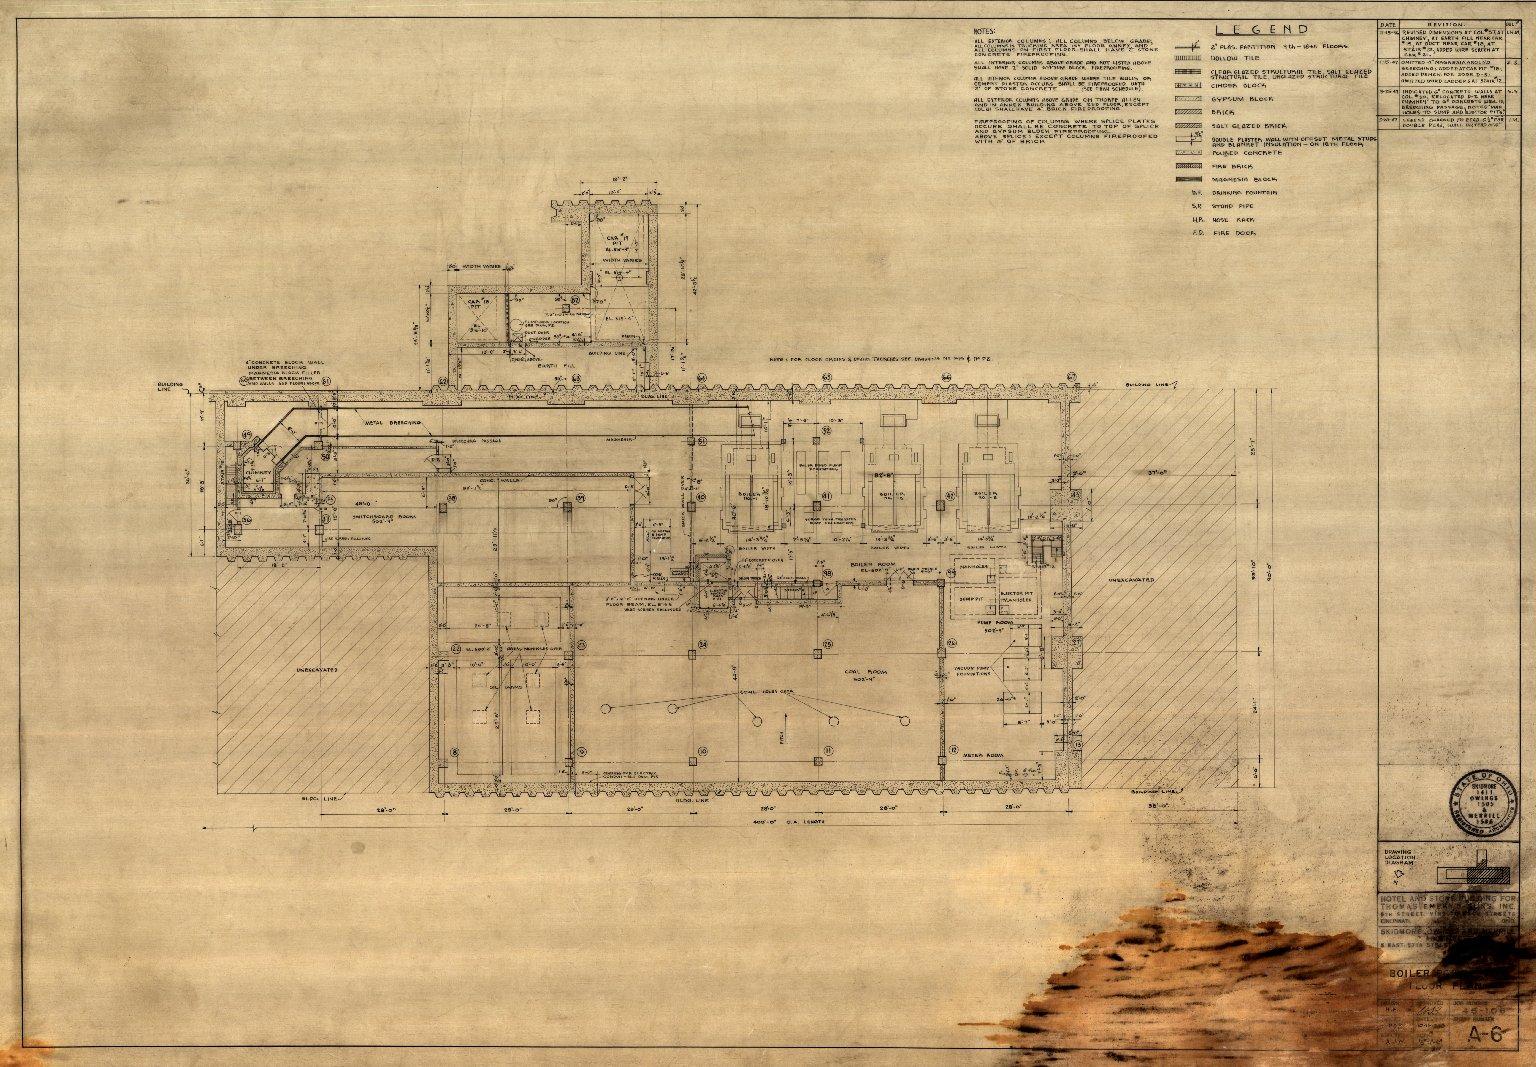 Boiler Room Level Floor Plan (A 6)